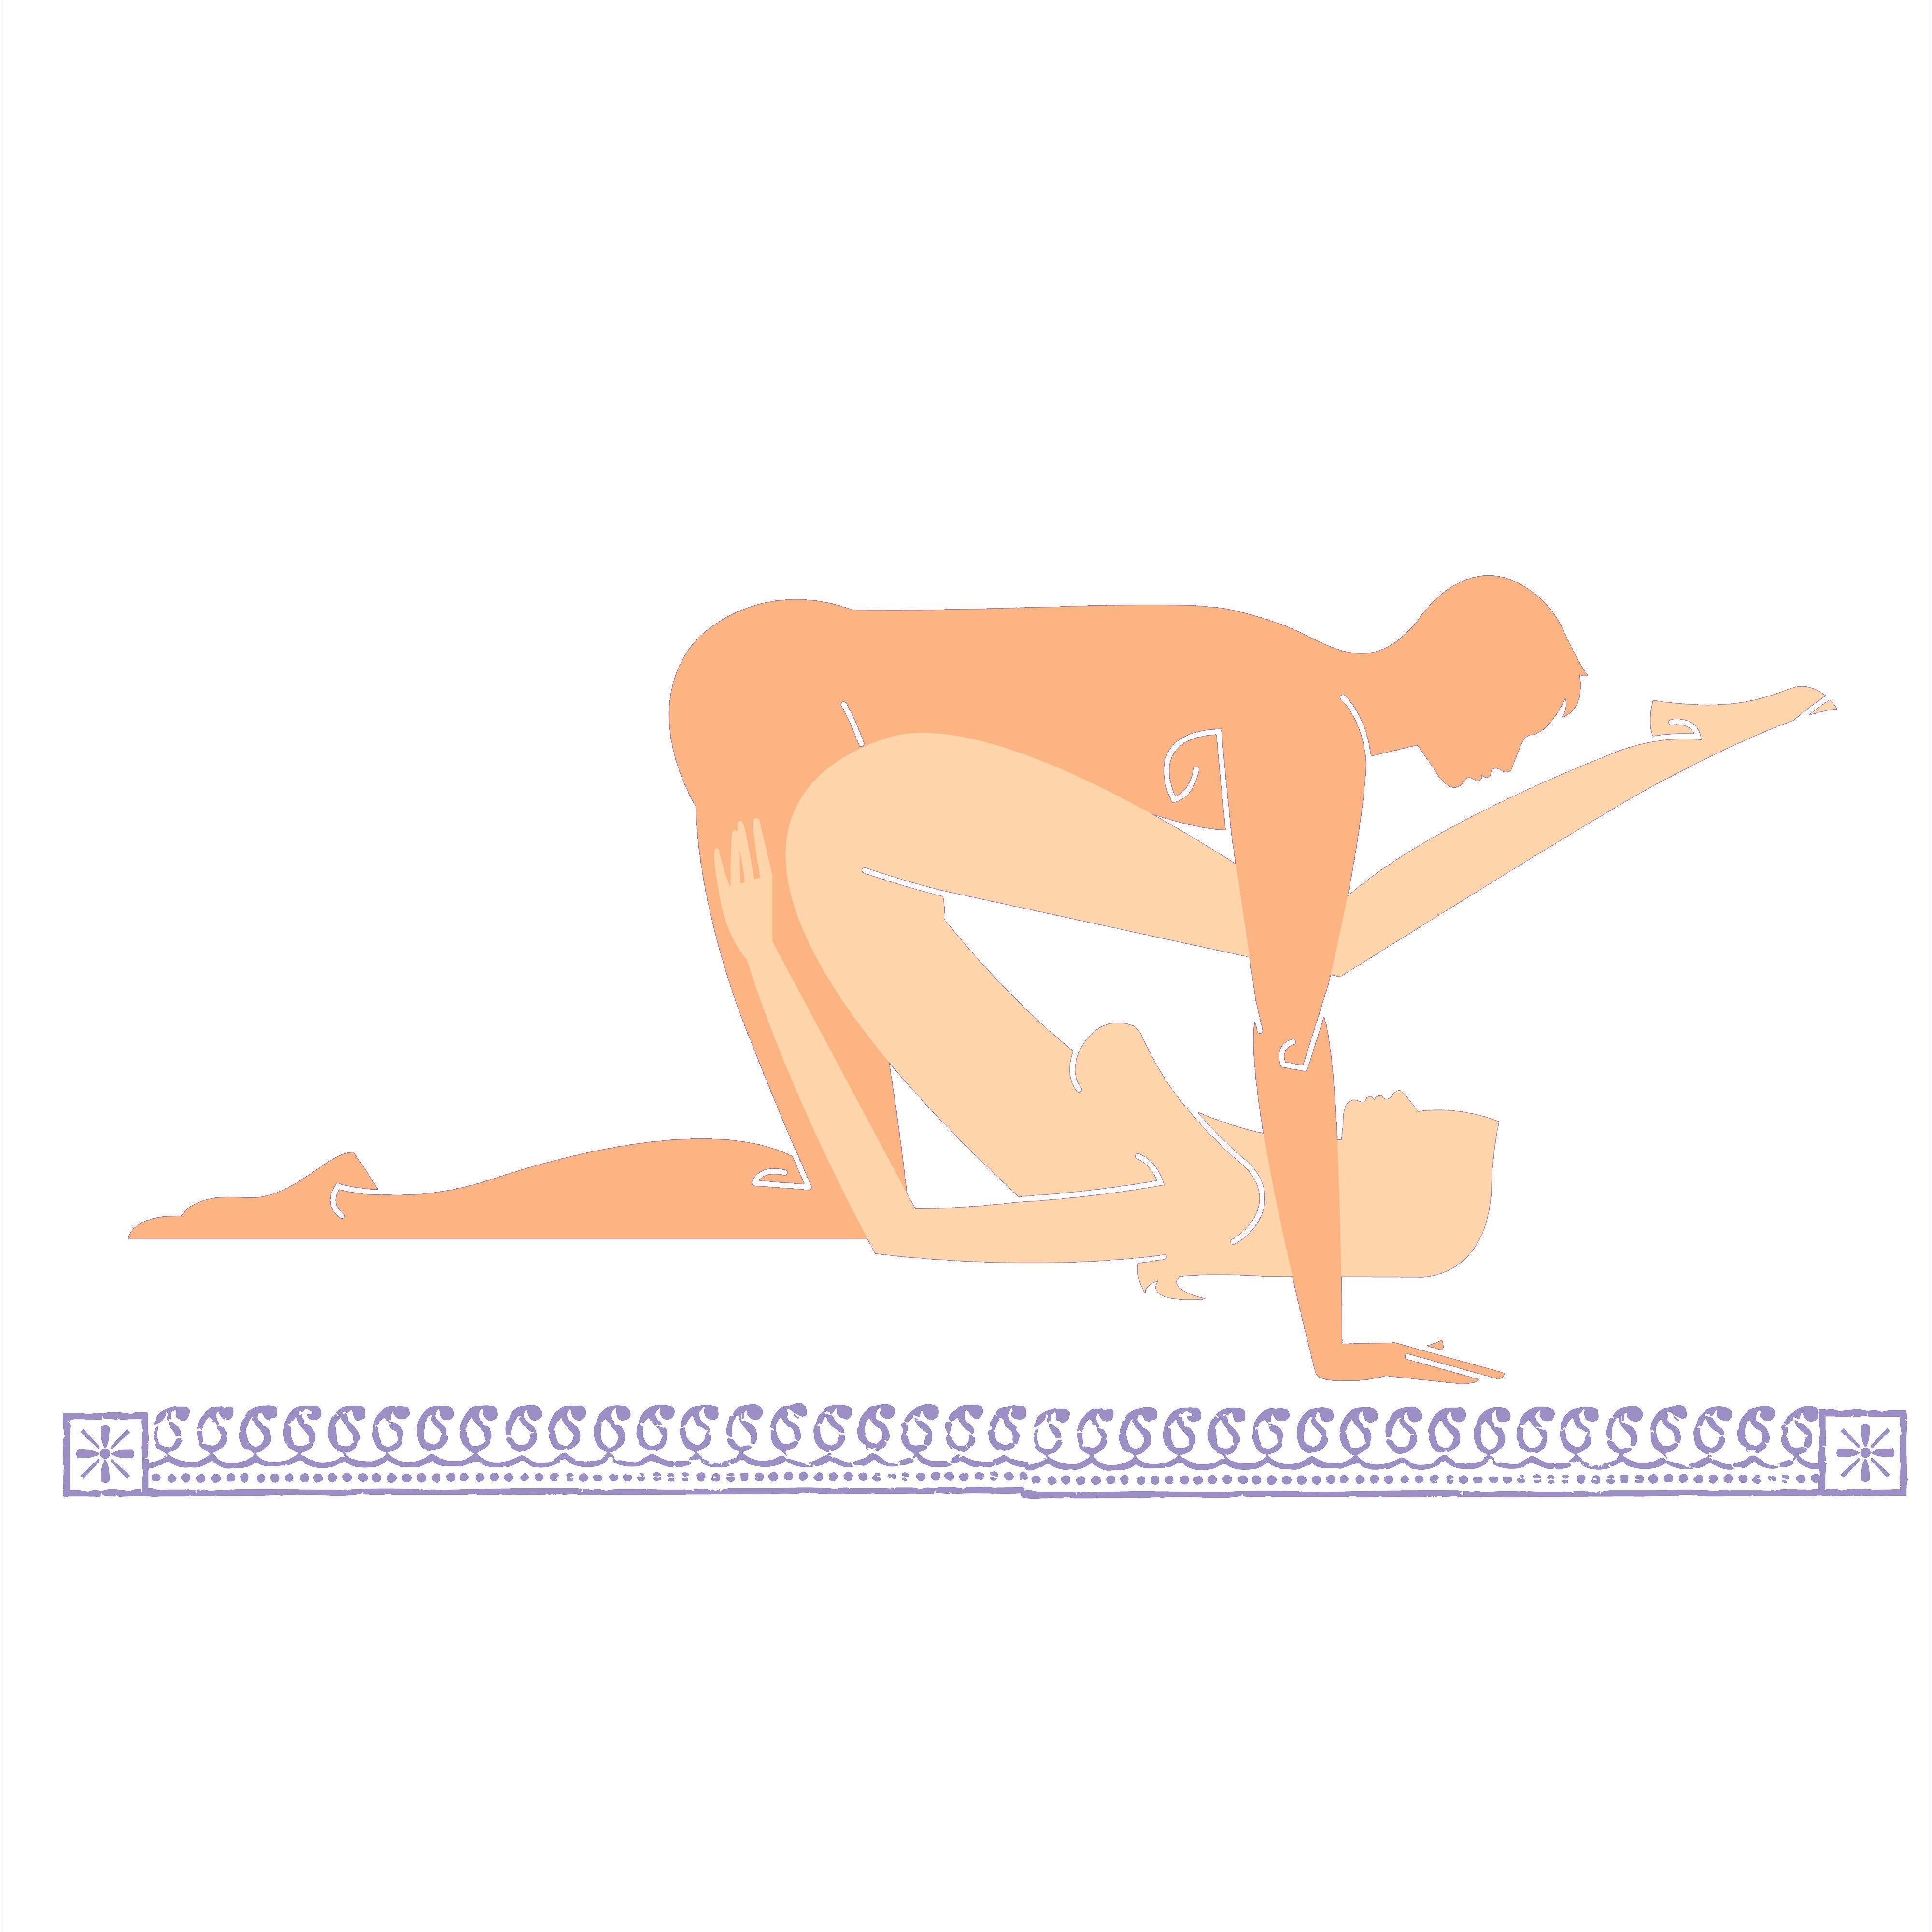 Seesaw sex position